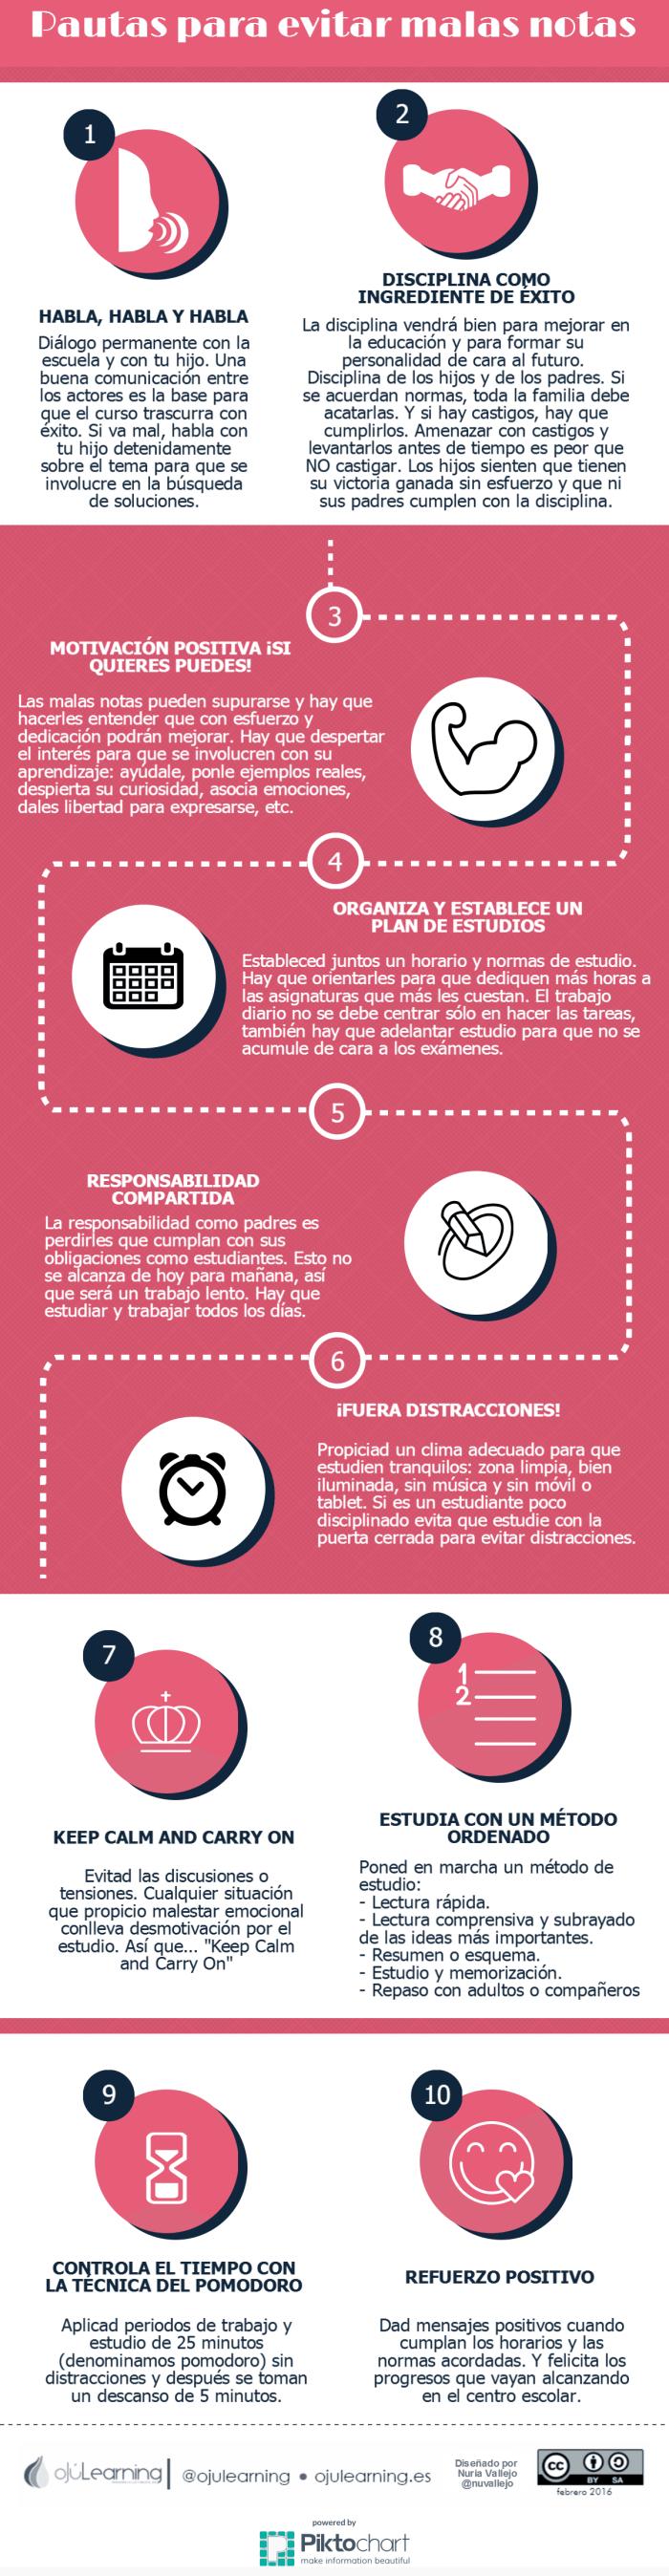 10ClavesMejorarHábitosEstudio-Infografía-BlogGesvin